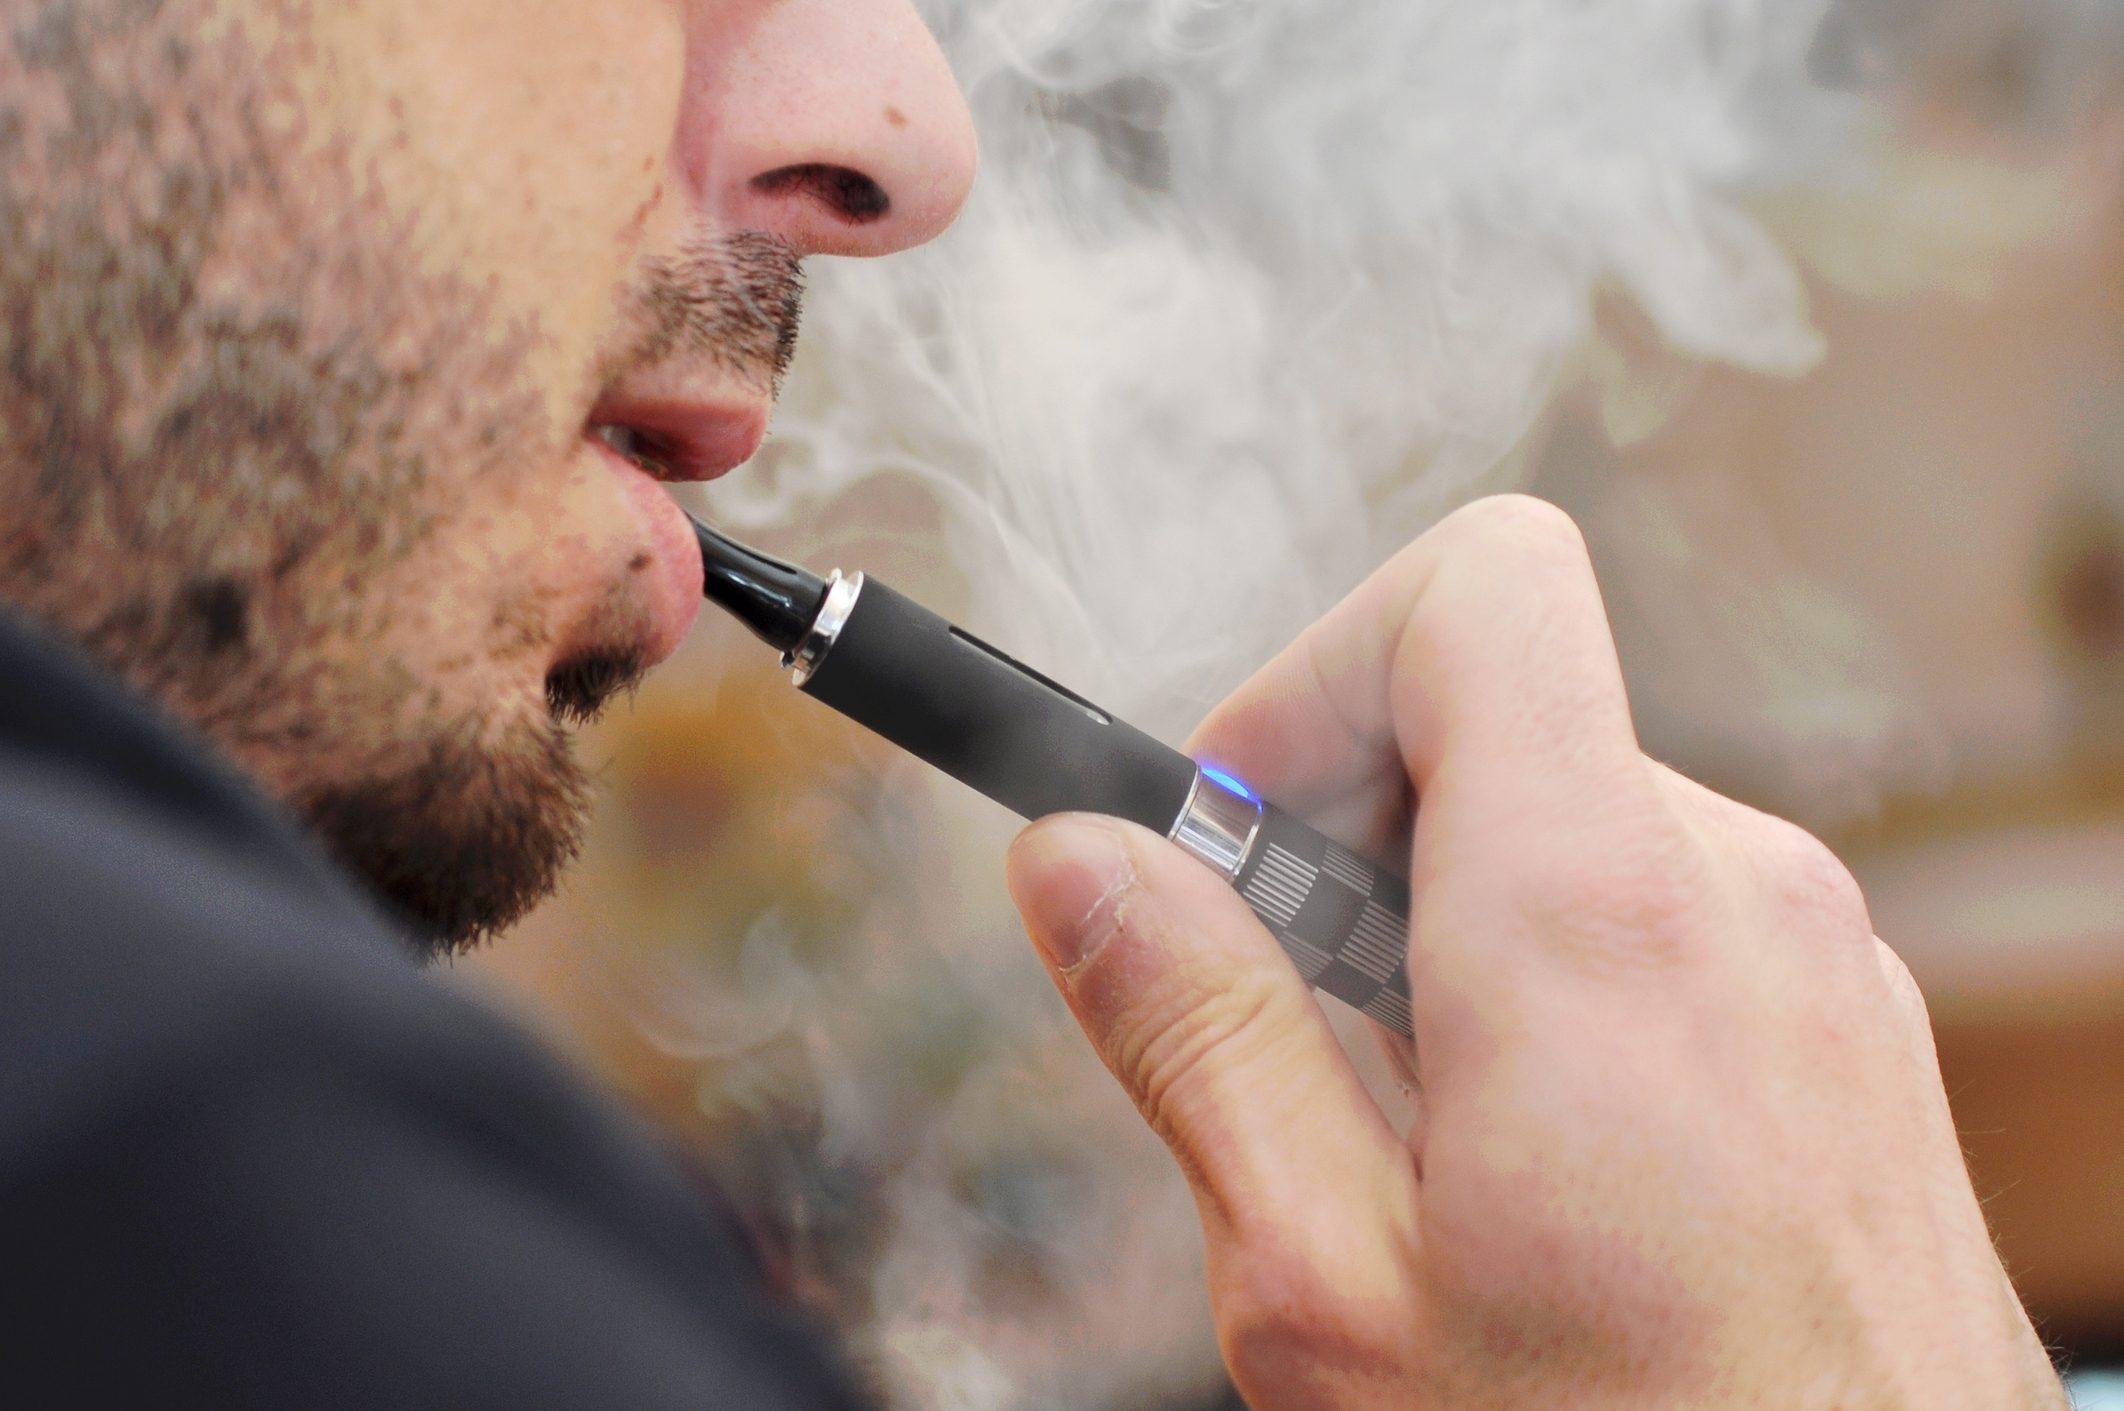 e-cigarette vaping device close up